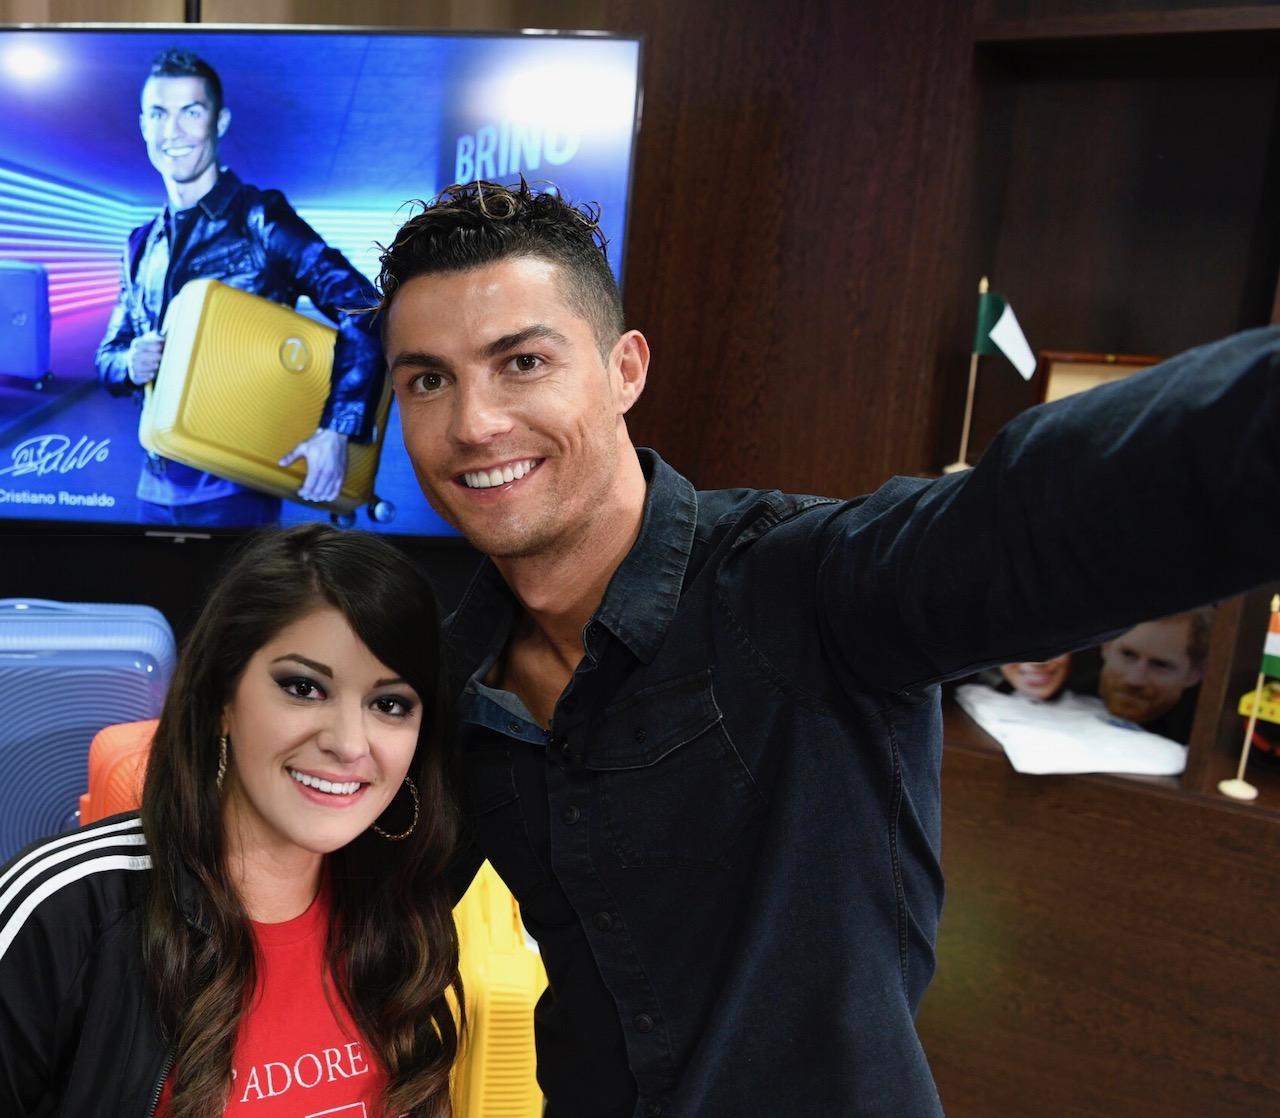 Santiago Bernabeu Stadium - Madrid Spain - Real Madrid - Beyond Casual B - Cristiano ronaldo